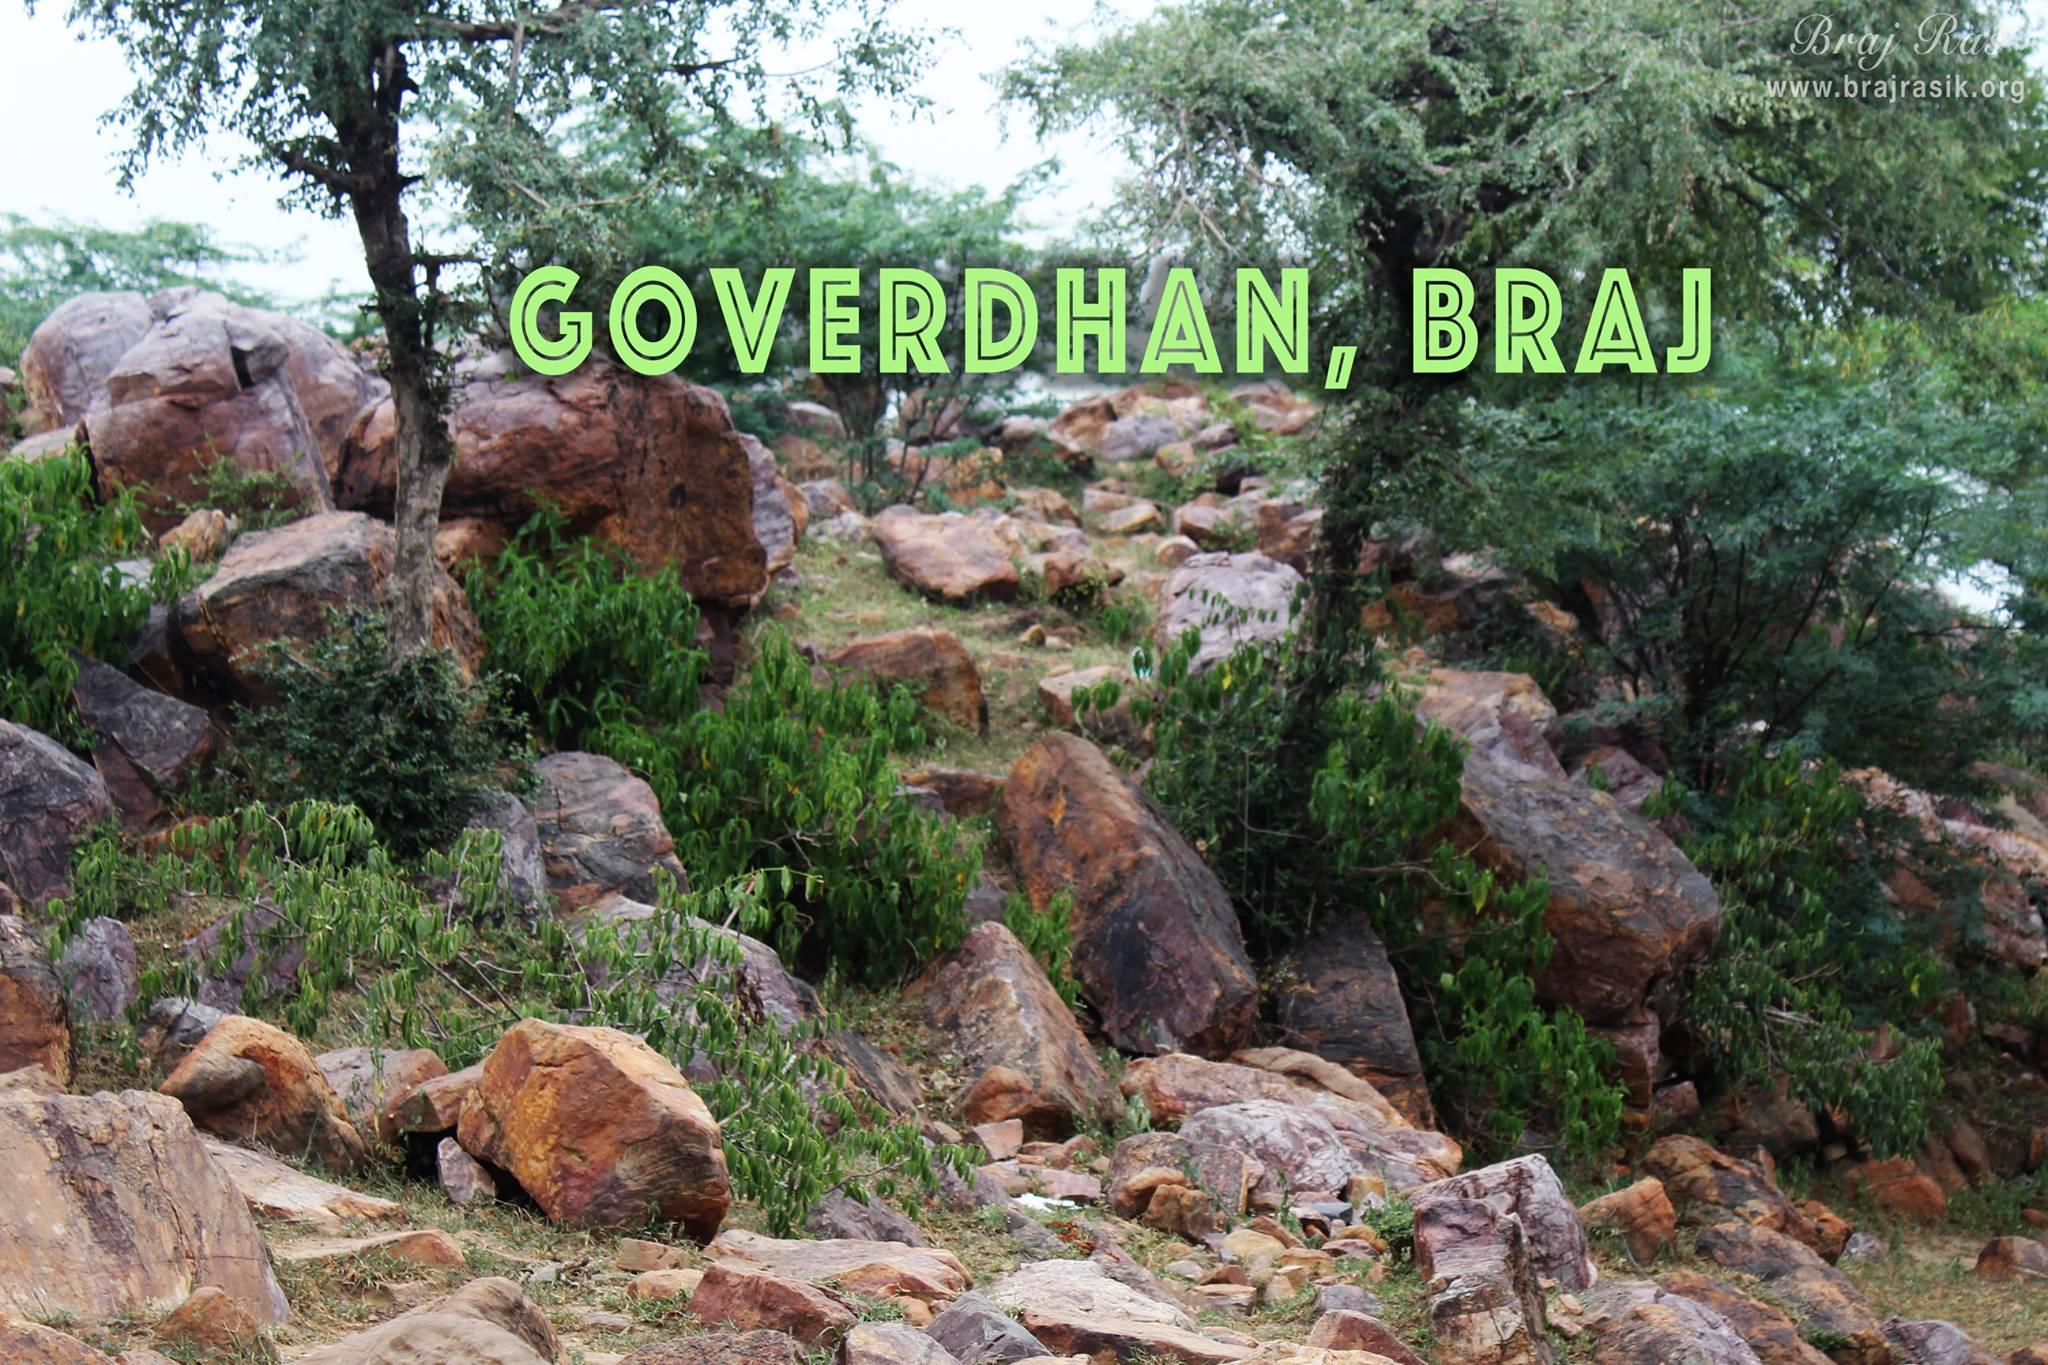 Giriraj Goverdhan, Braj - Pastimes